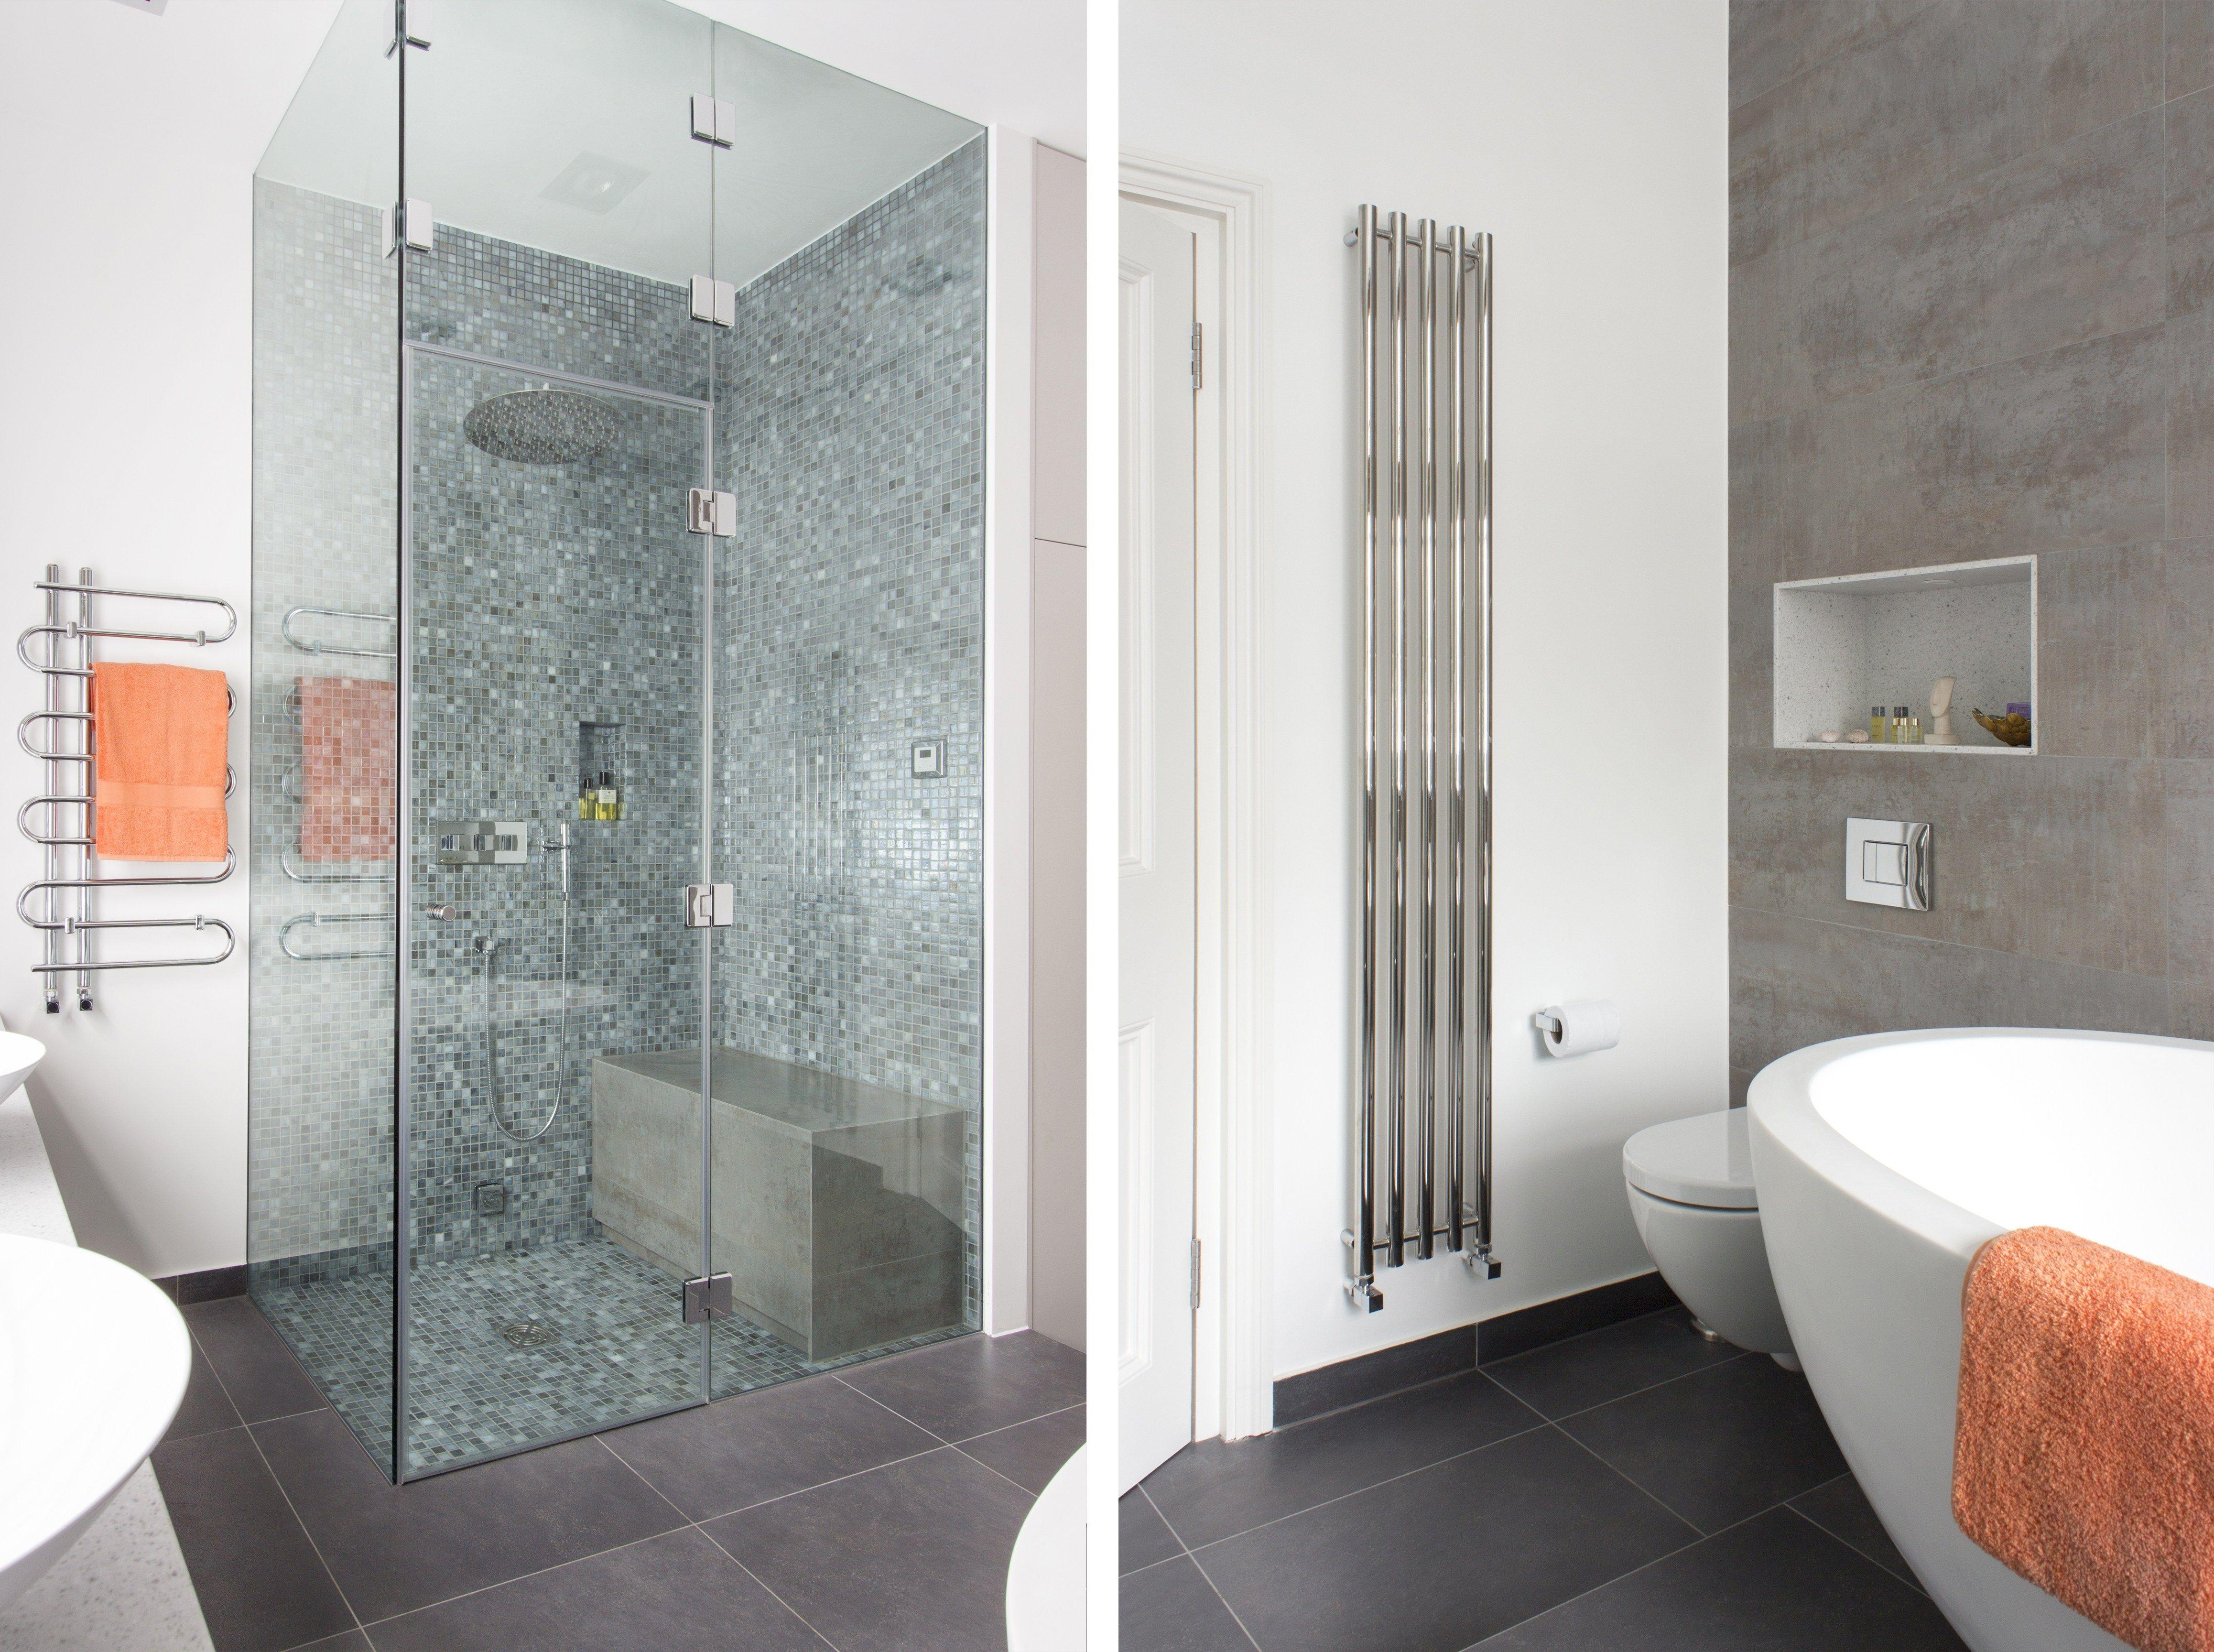 Get Inspired By These Amazing Designs Http Www Contemporarylighting Eu Contemporarylighting Contemporar Bathroom Layout Bathroom Interior Grey Bathrooms